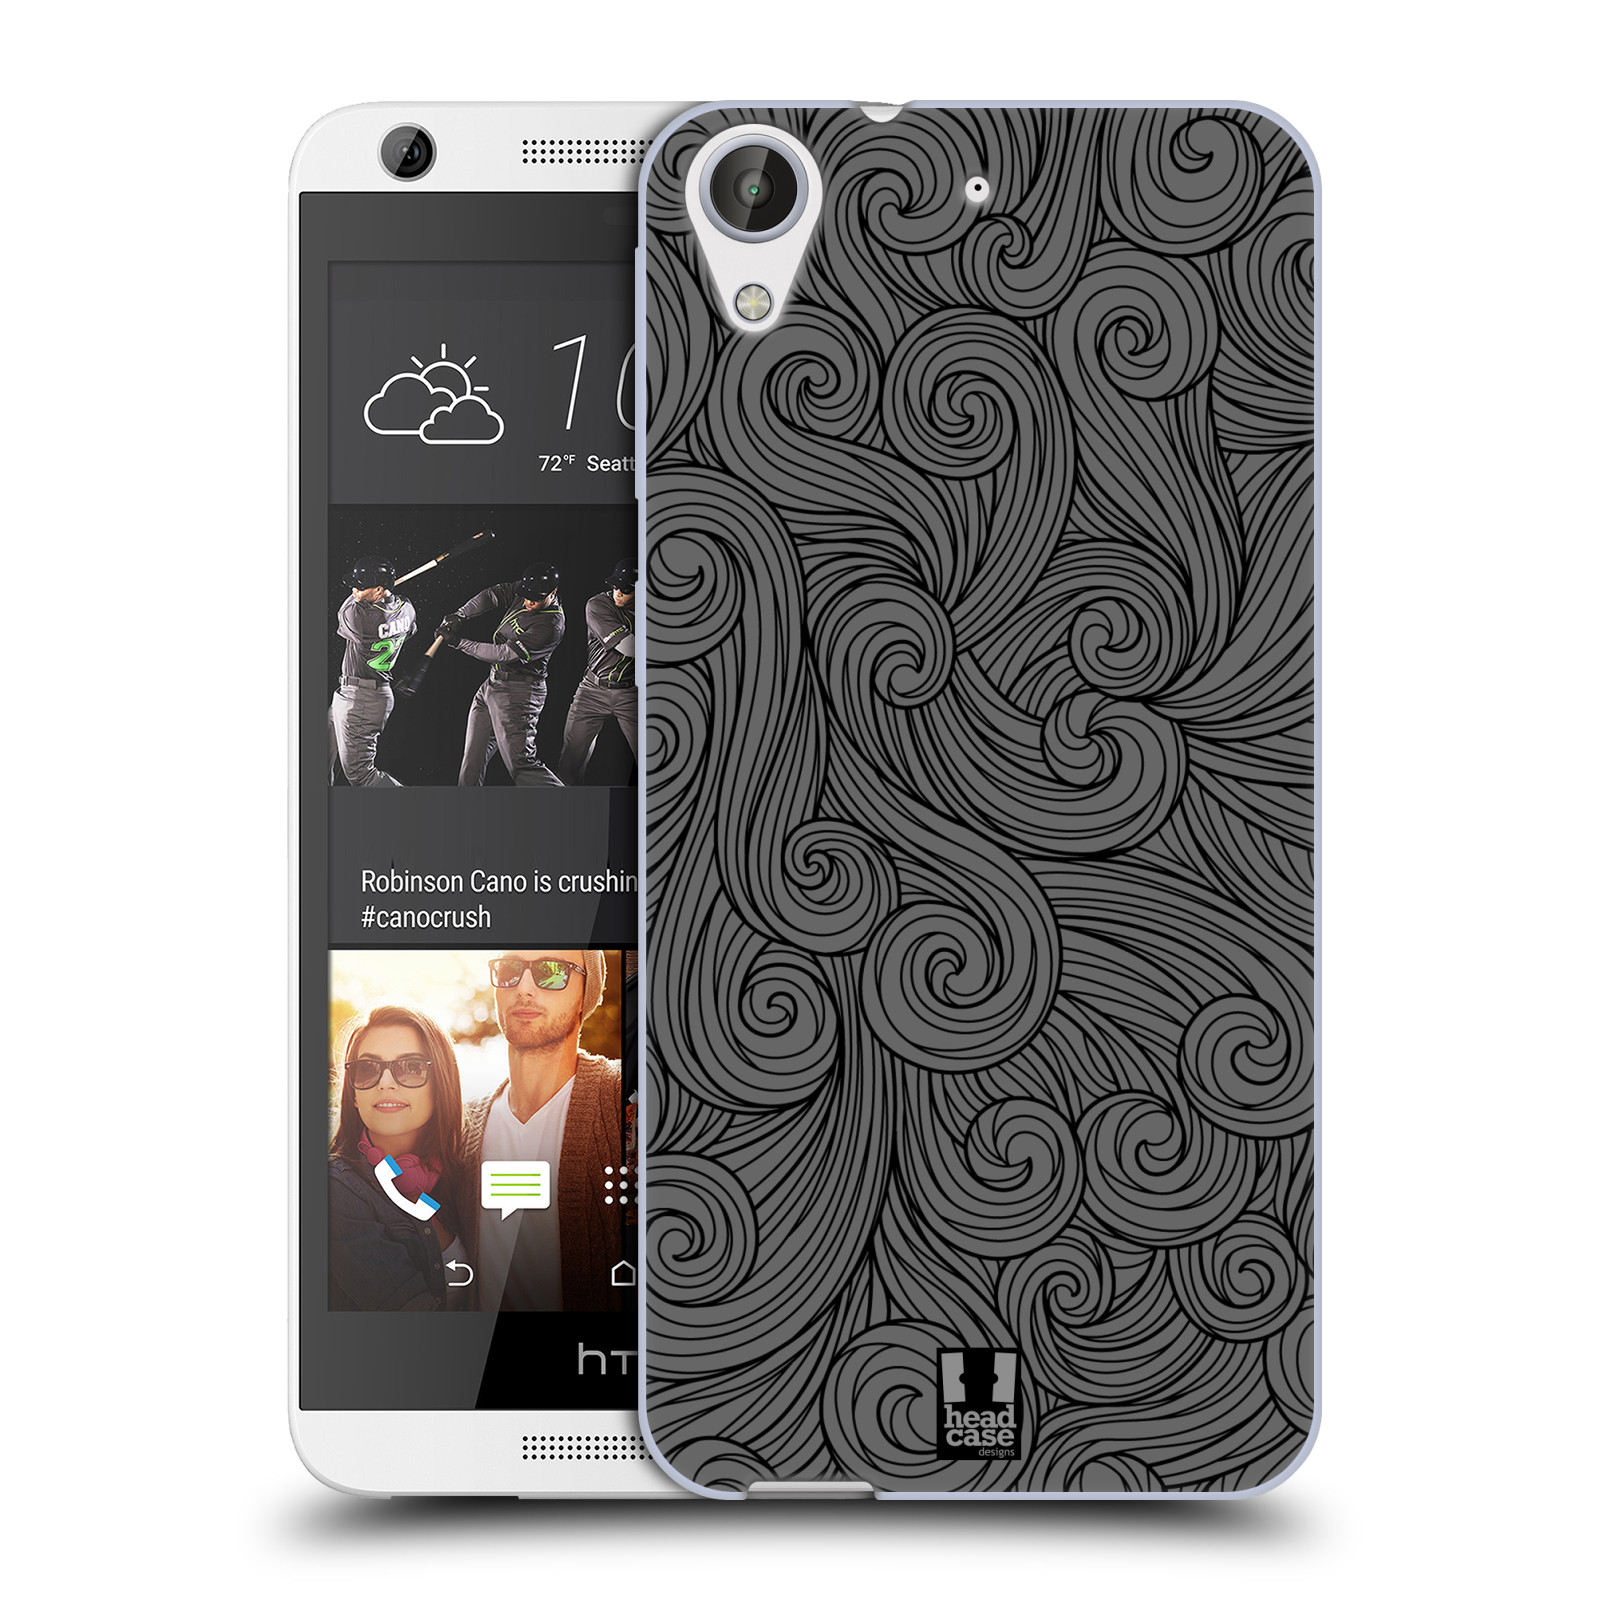 Silikonové pouzdro na mobil HTC Desire 626 / 626G HEAD CASE Dark Grey Swirls (Silikonový kryt či obal na mobilní telefon HTC Desire 626 a 626G Dual SIM)